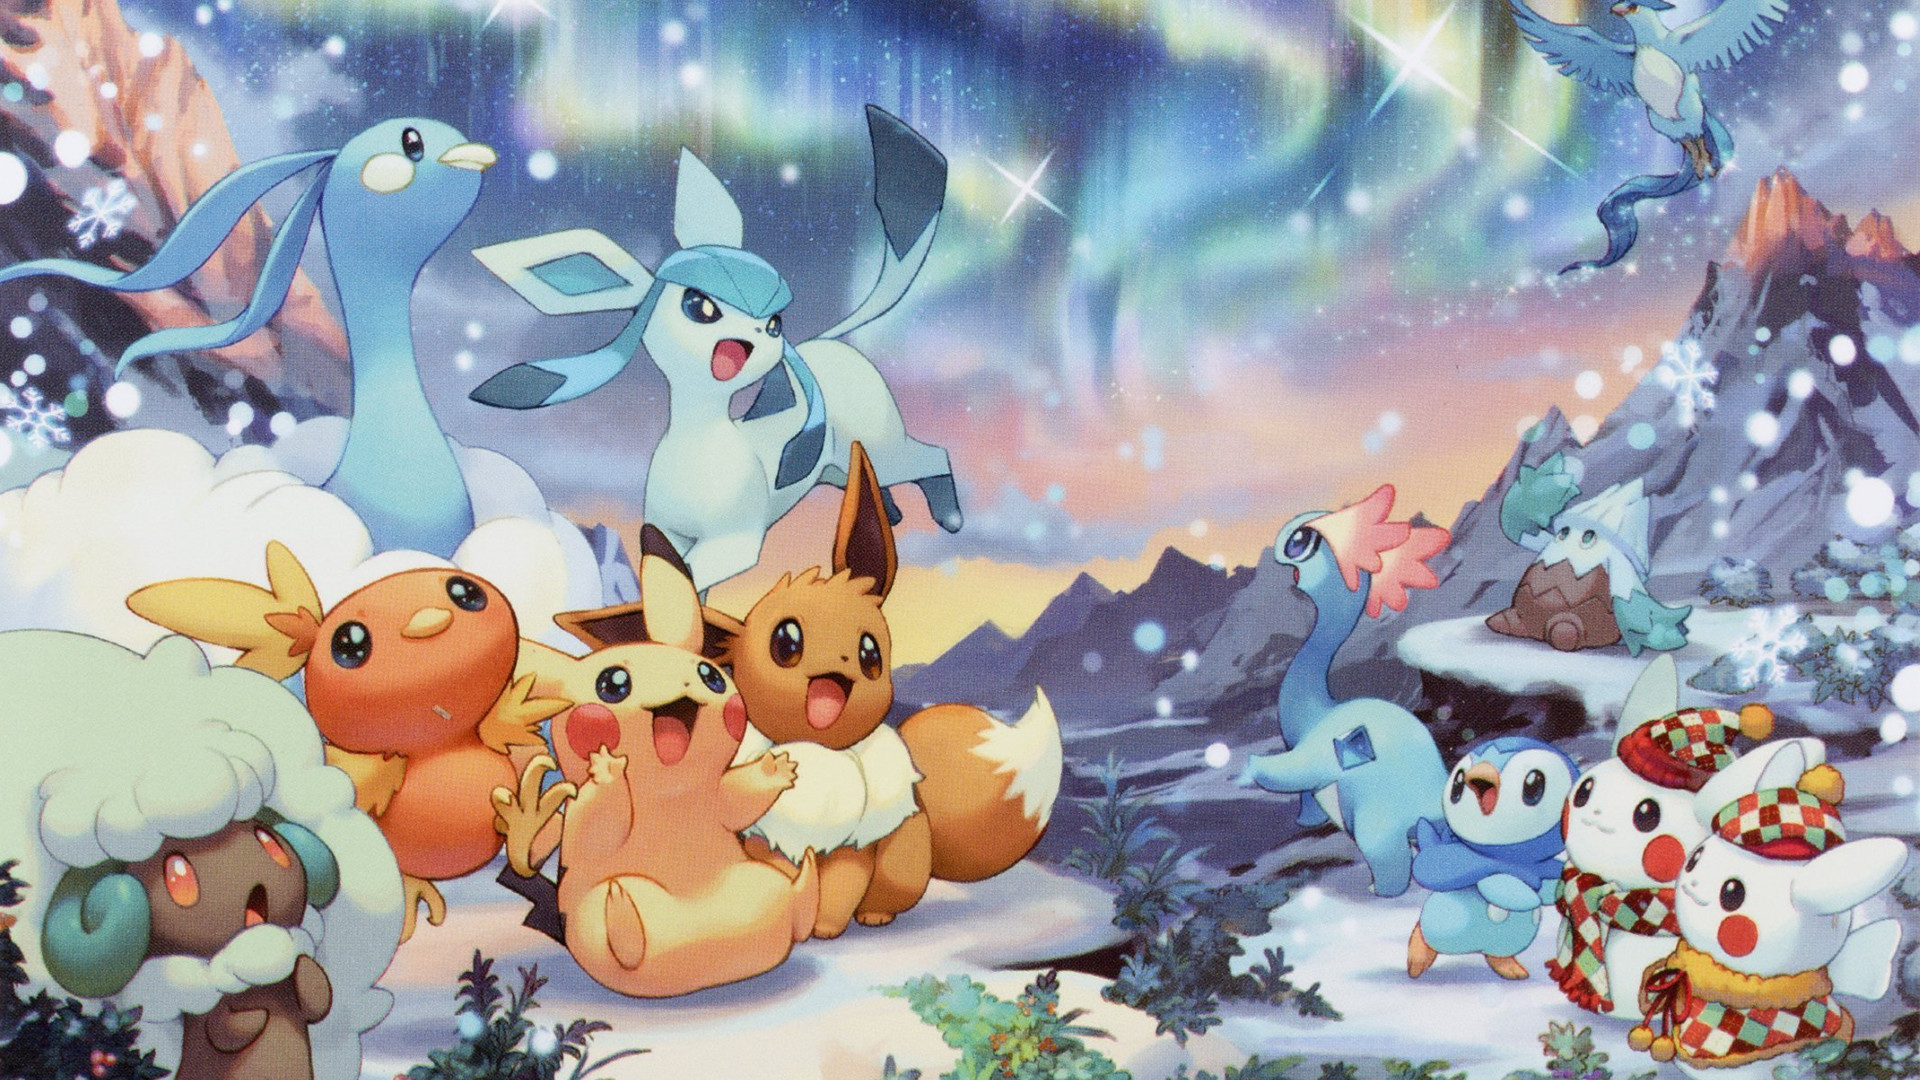 Pokemon Christmas Wallpaper ·①